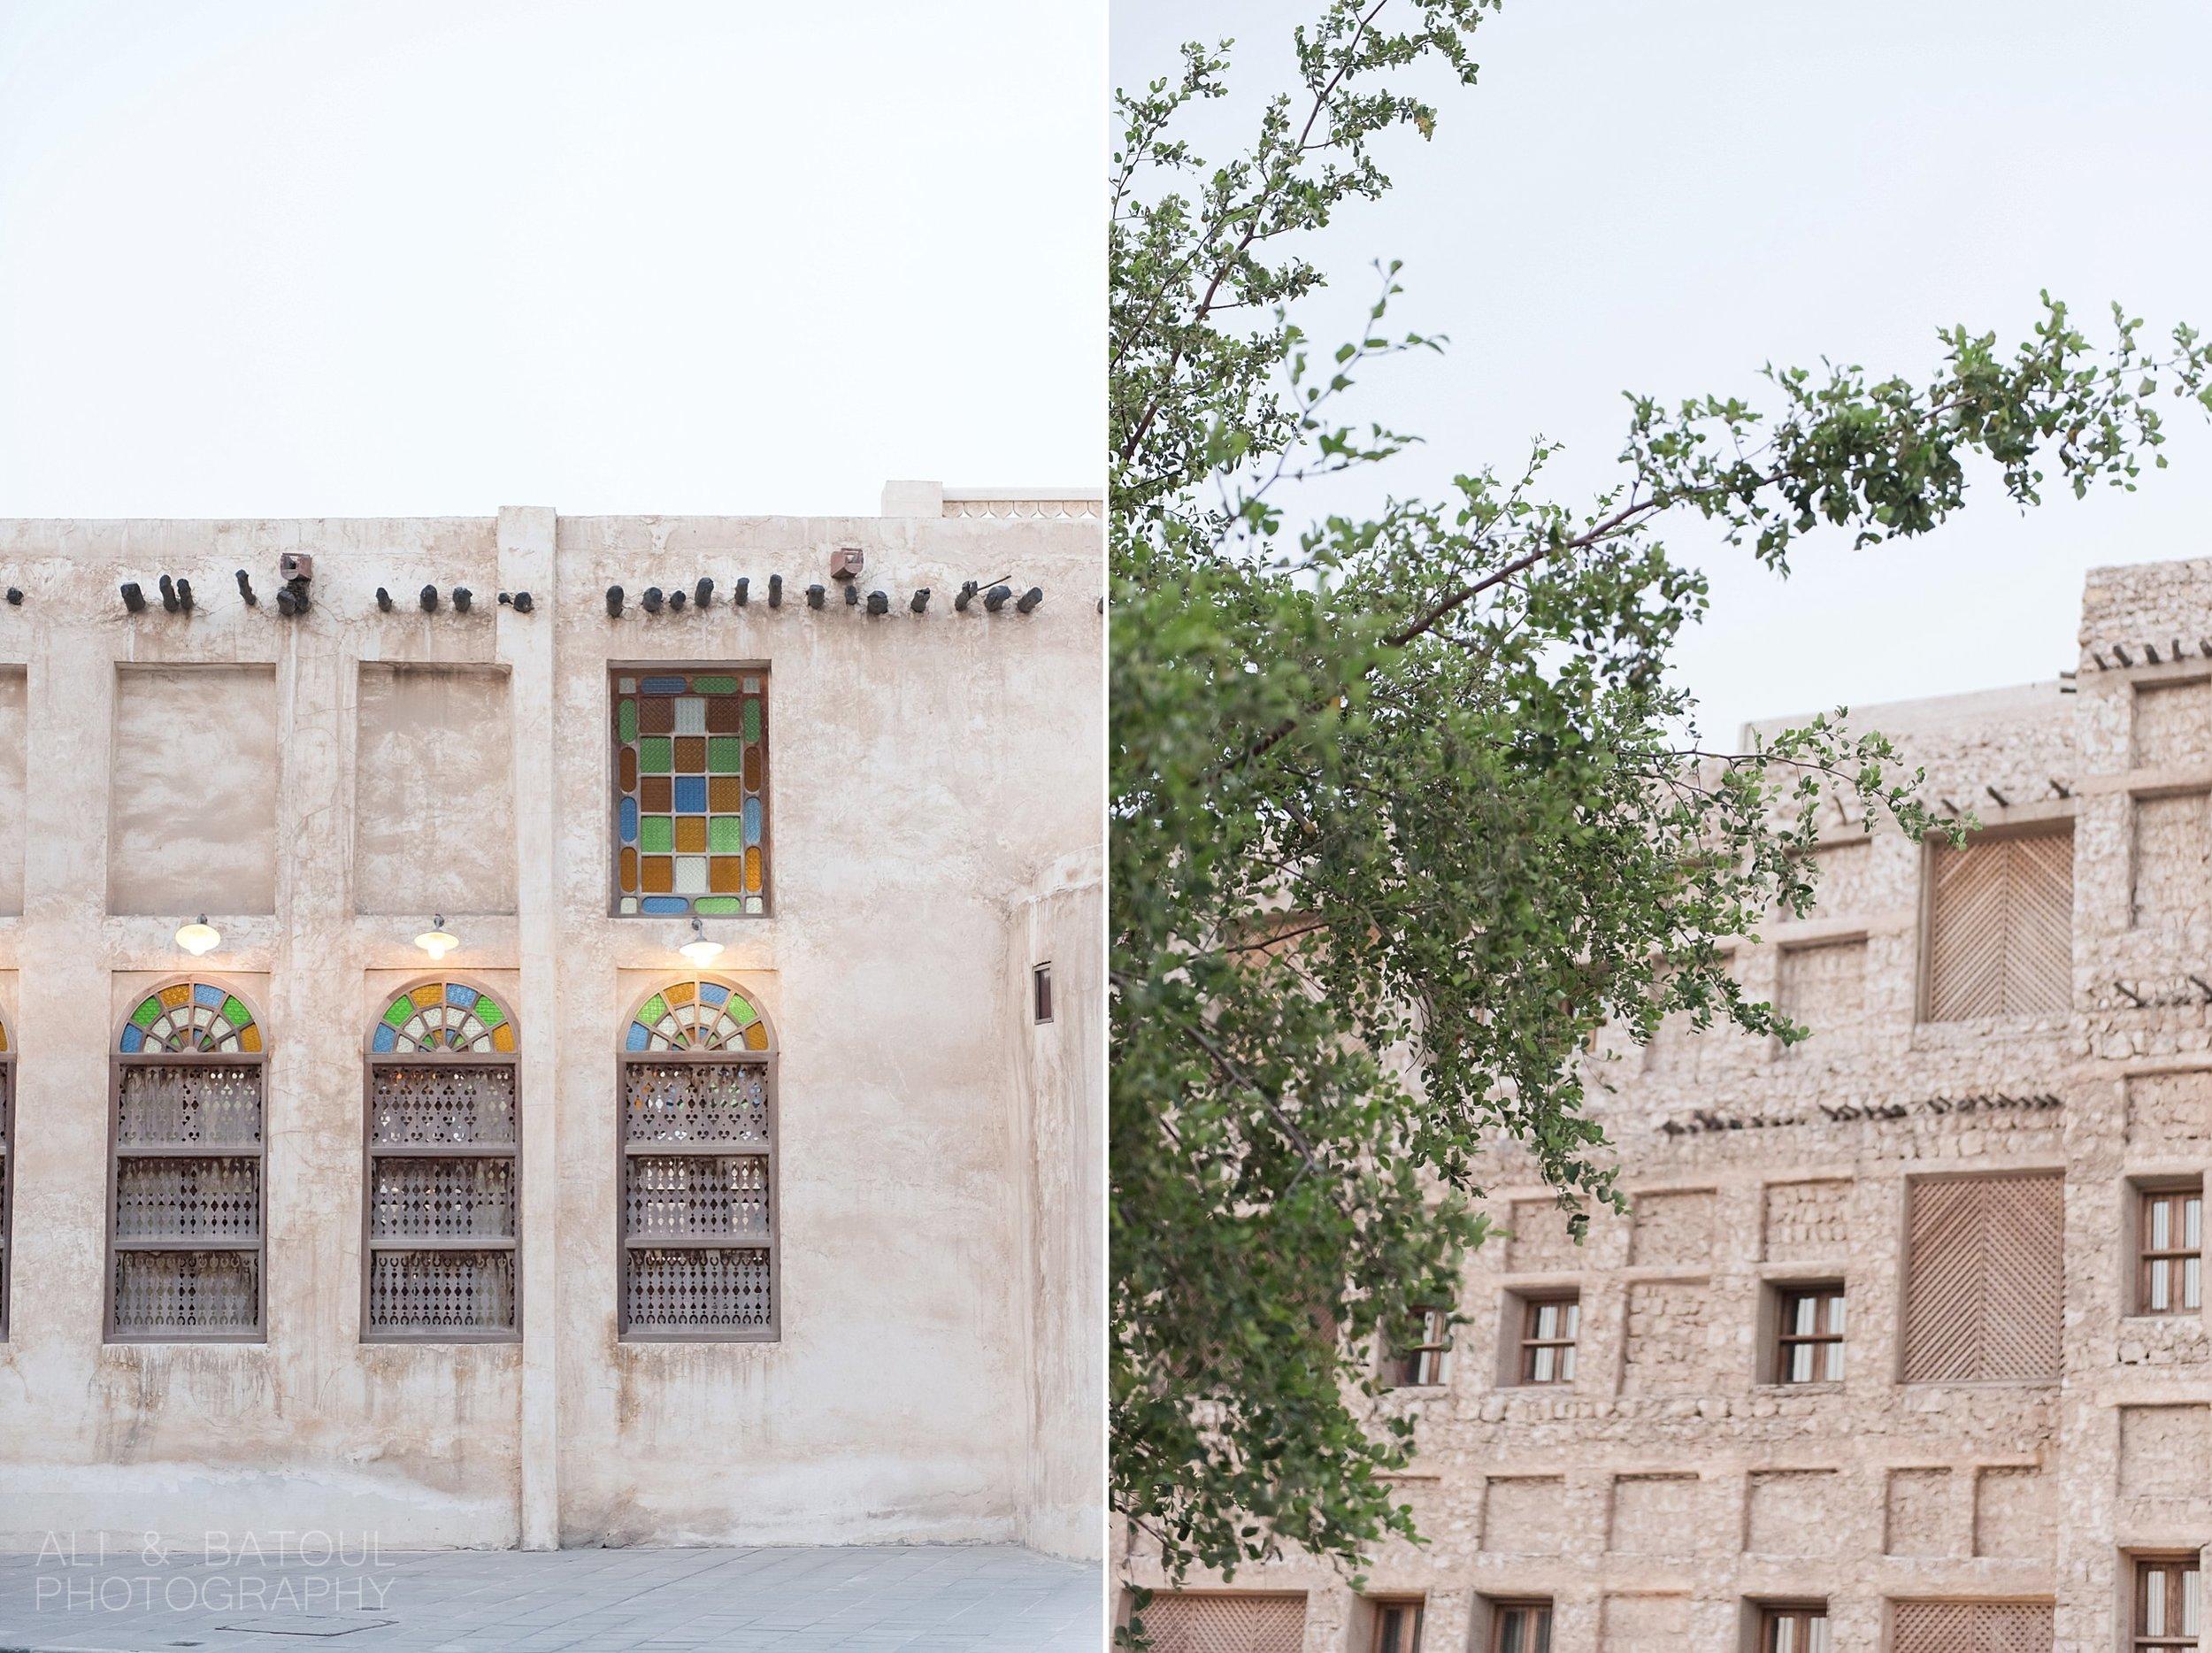 Ali & Batoul Photography - Doha Travel Photography_0023.jpg